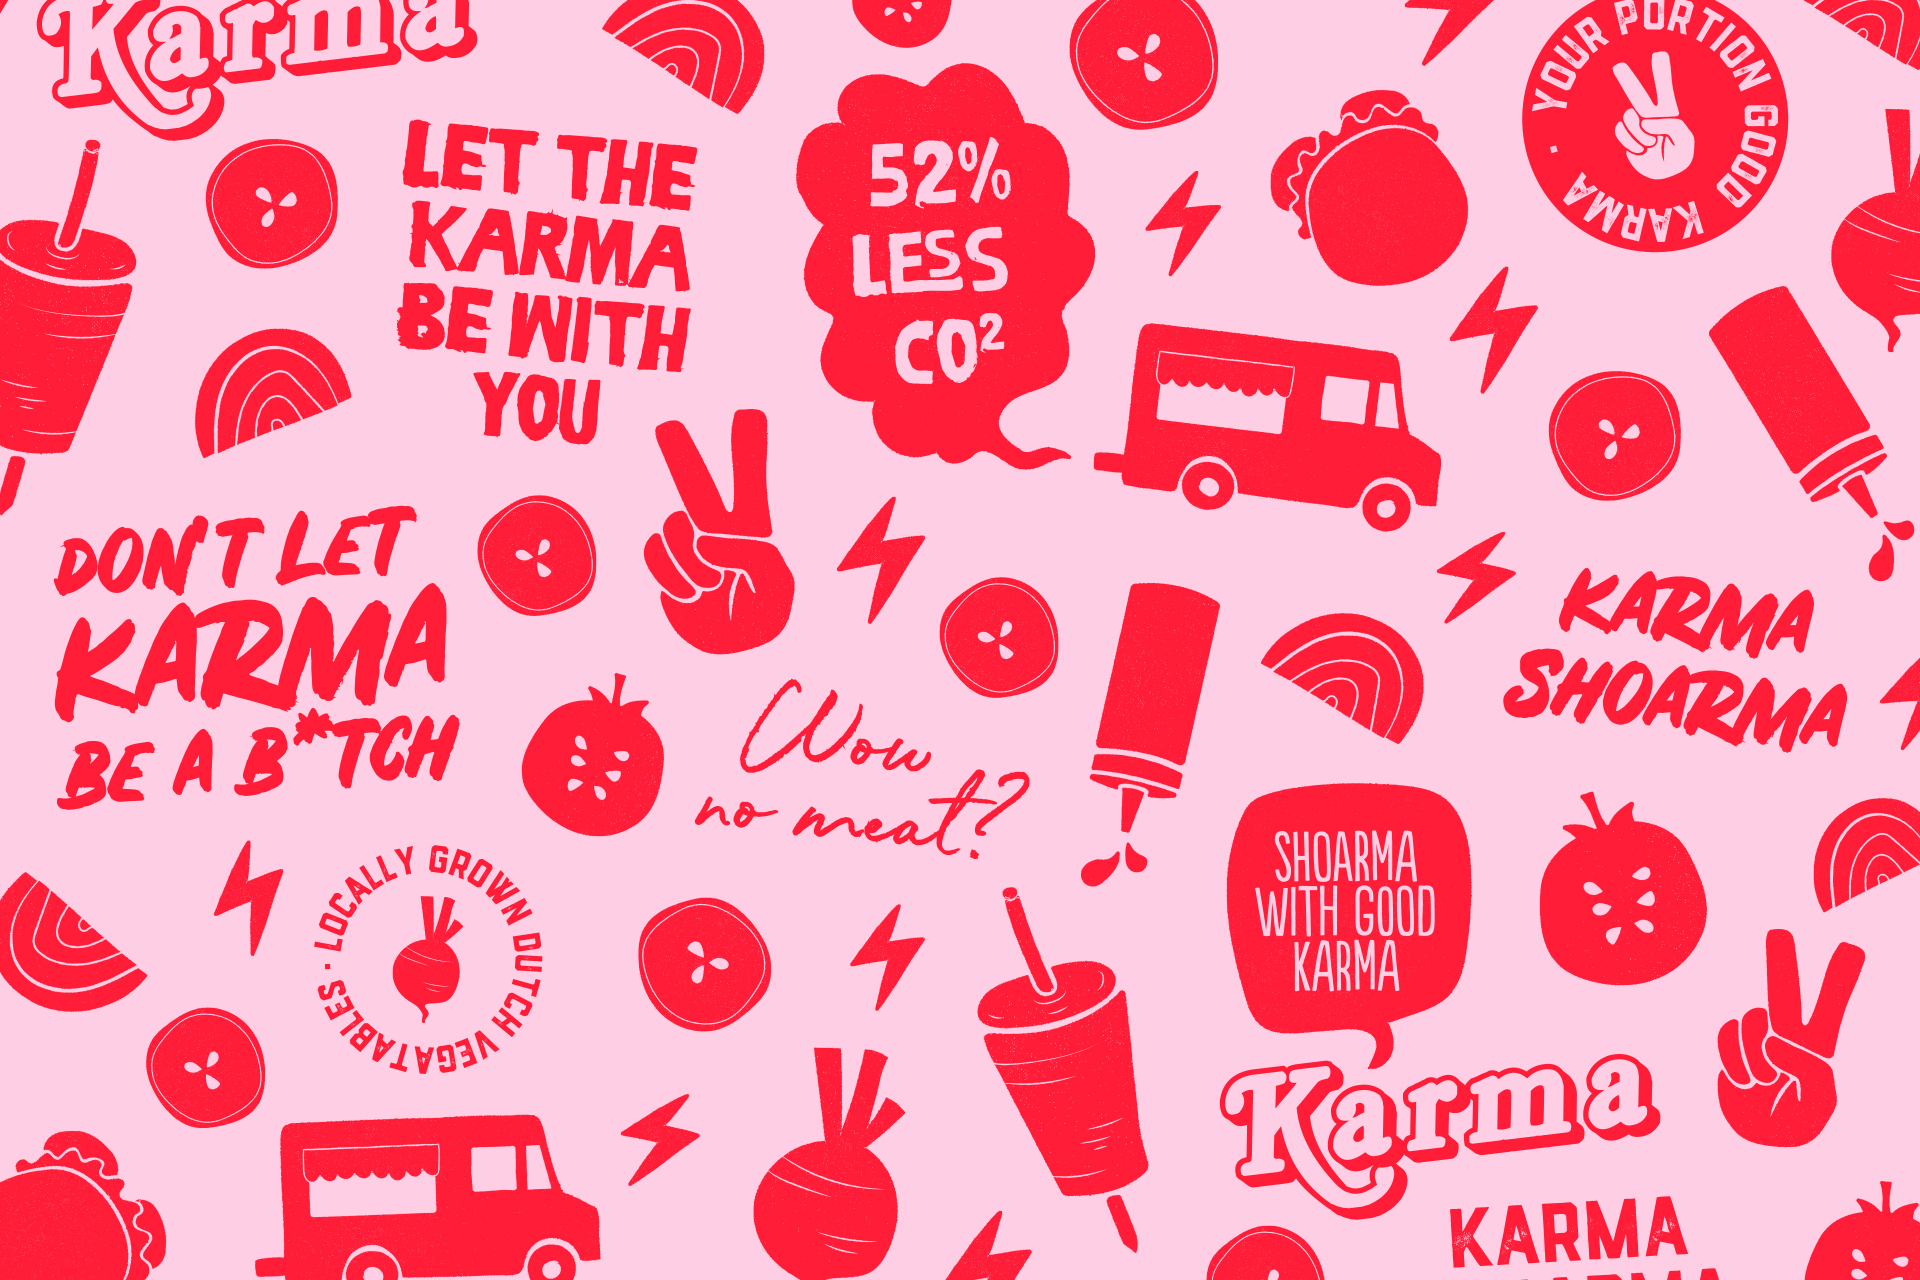 Karmashoarma_Pattern